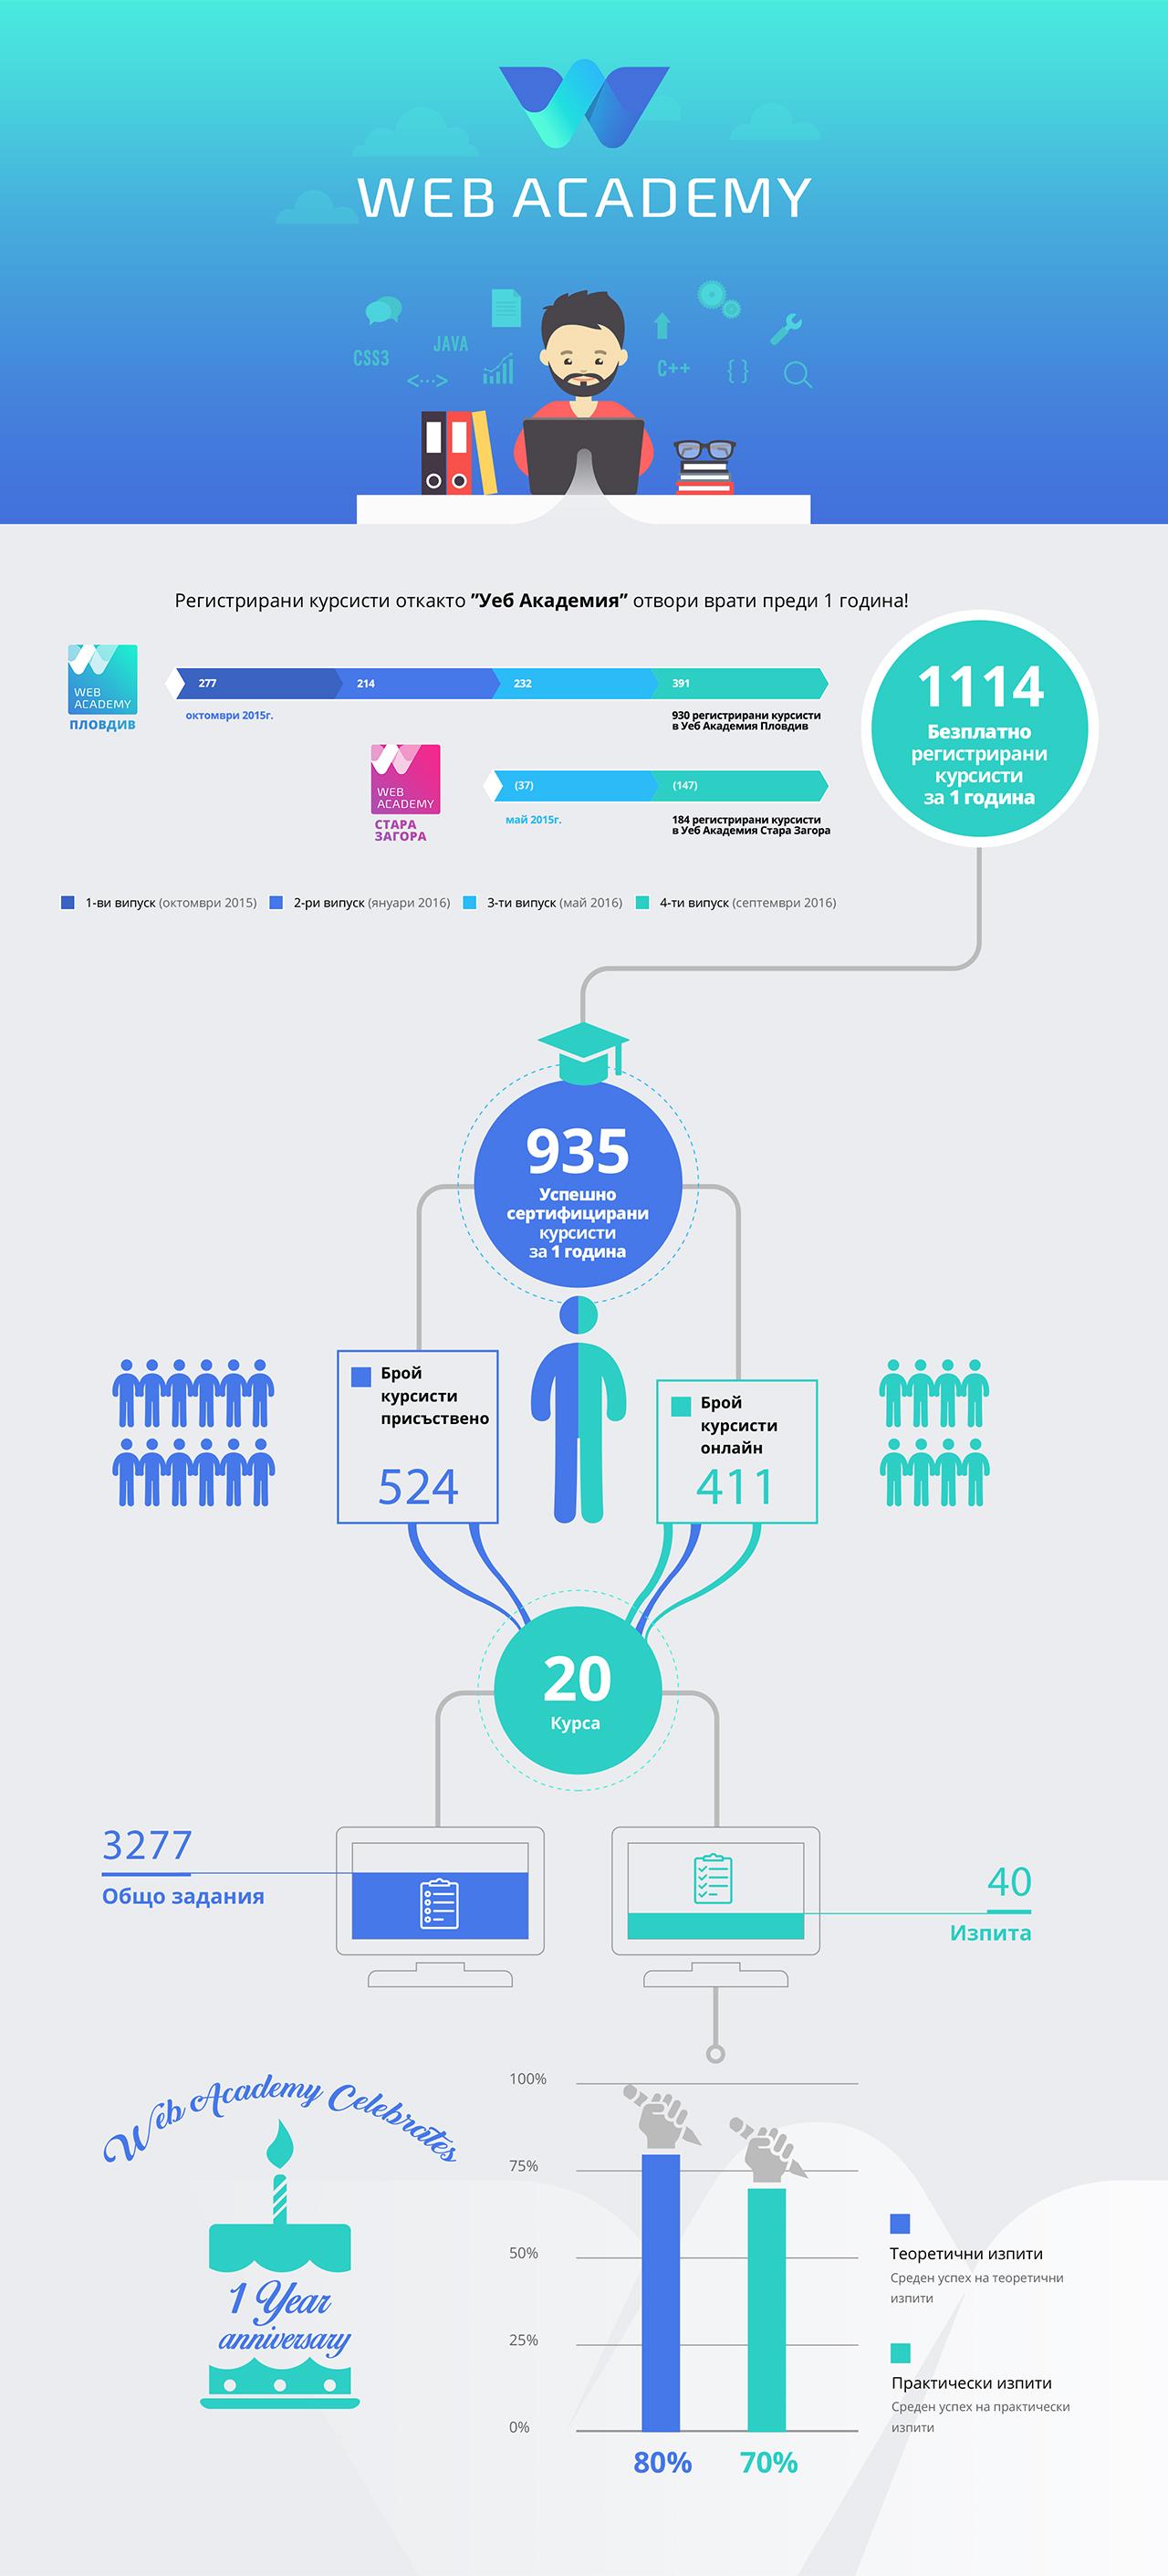 webacademy 1 year infographic